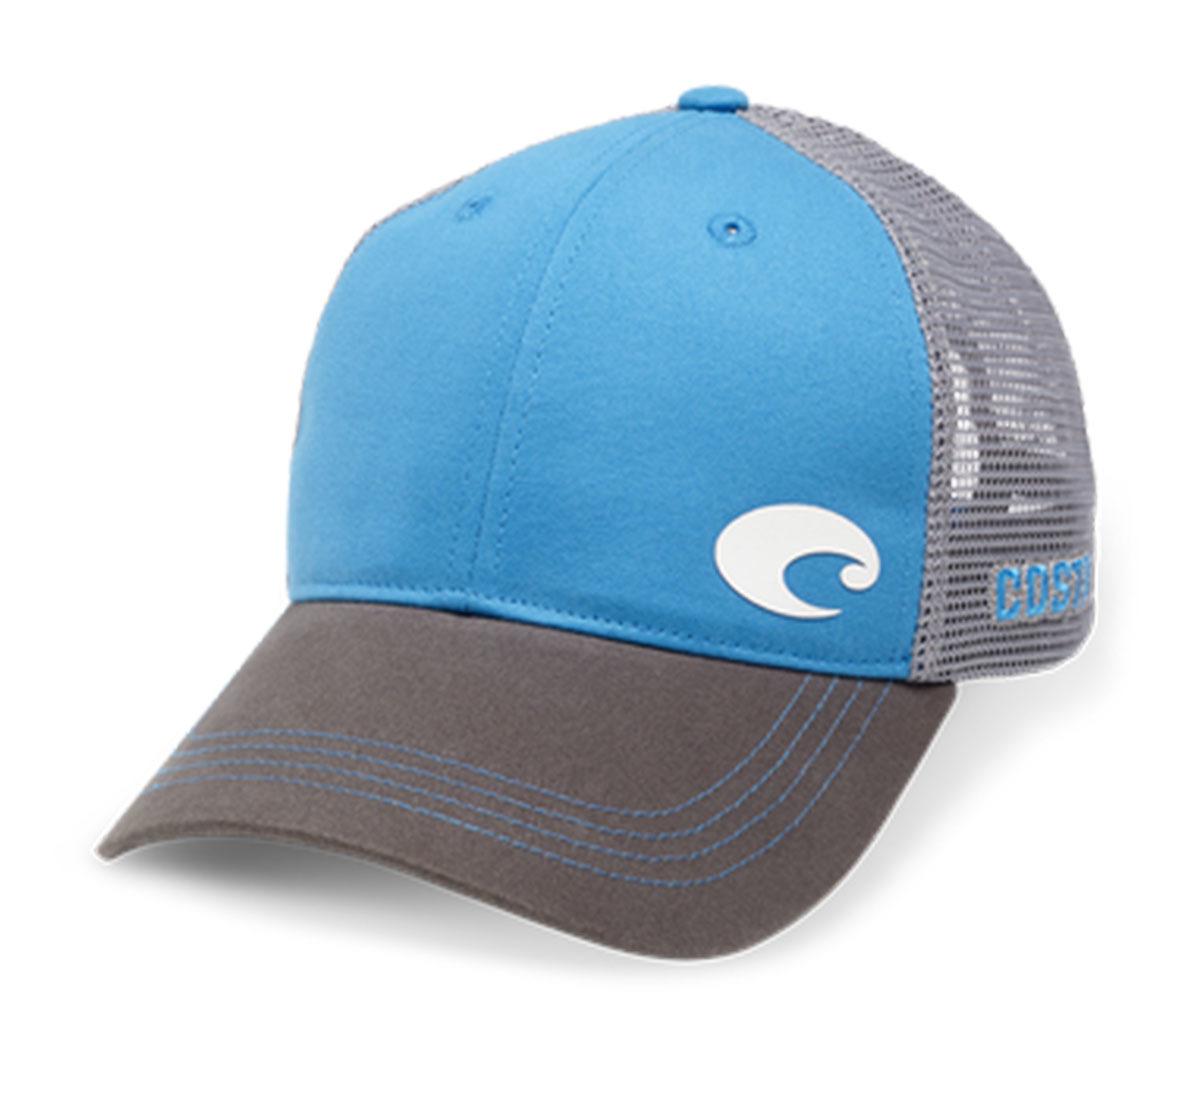 05f3972f71 Costa Del Mar Offset logo HD Trucker Hat